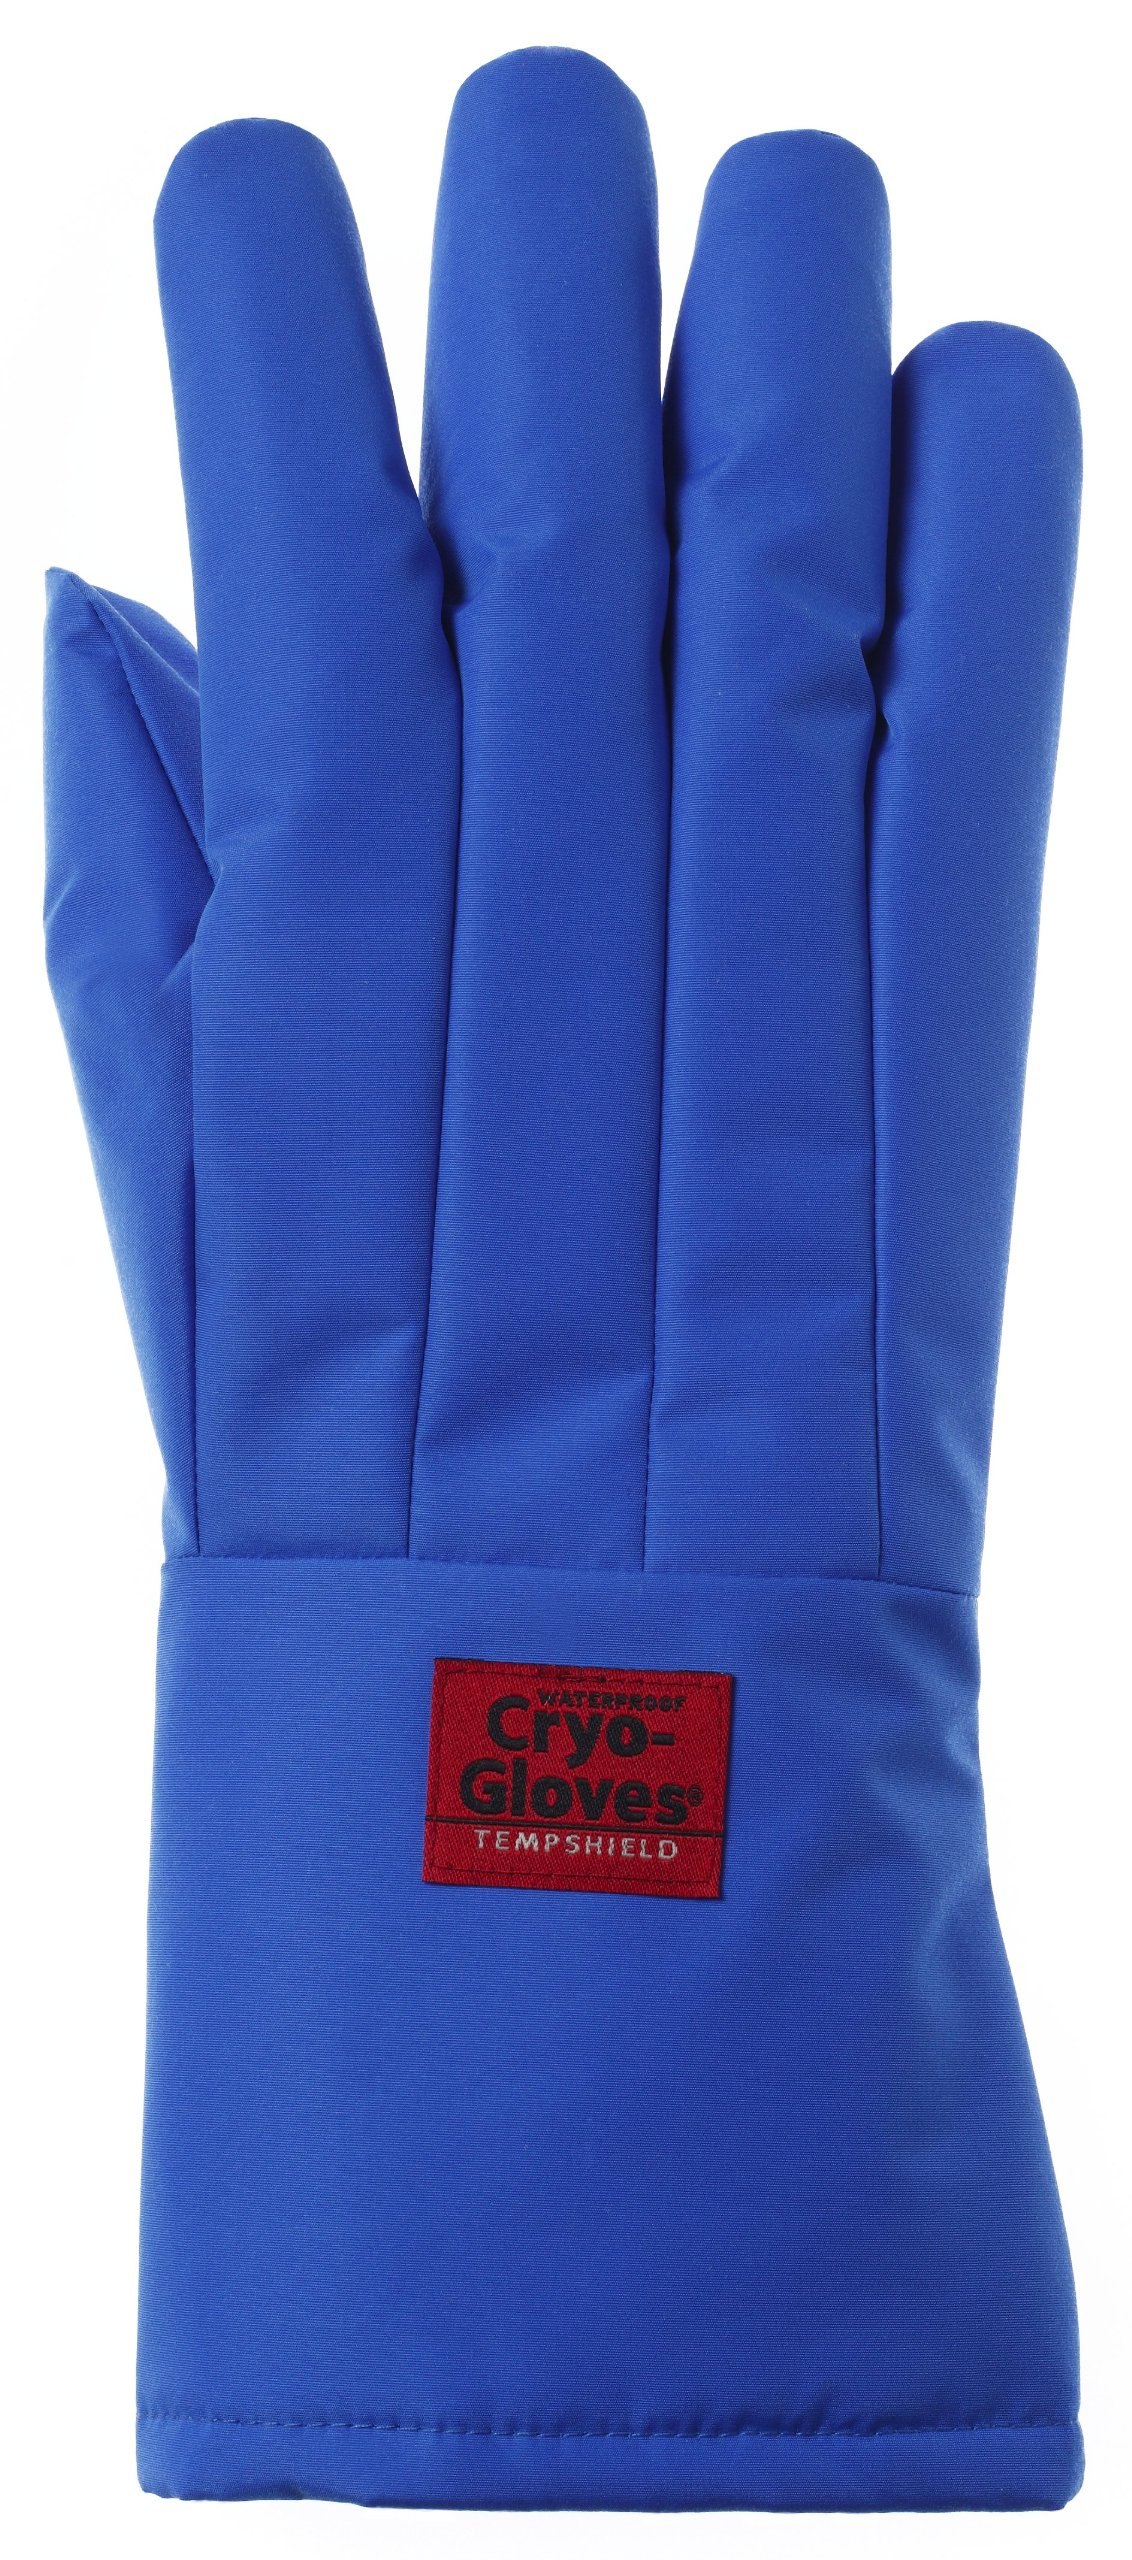 Waterproof Cryo-Gloves MAMWP Cryogenic Gloves, Mid-Arm, Medium